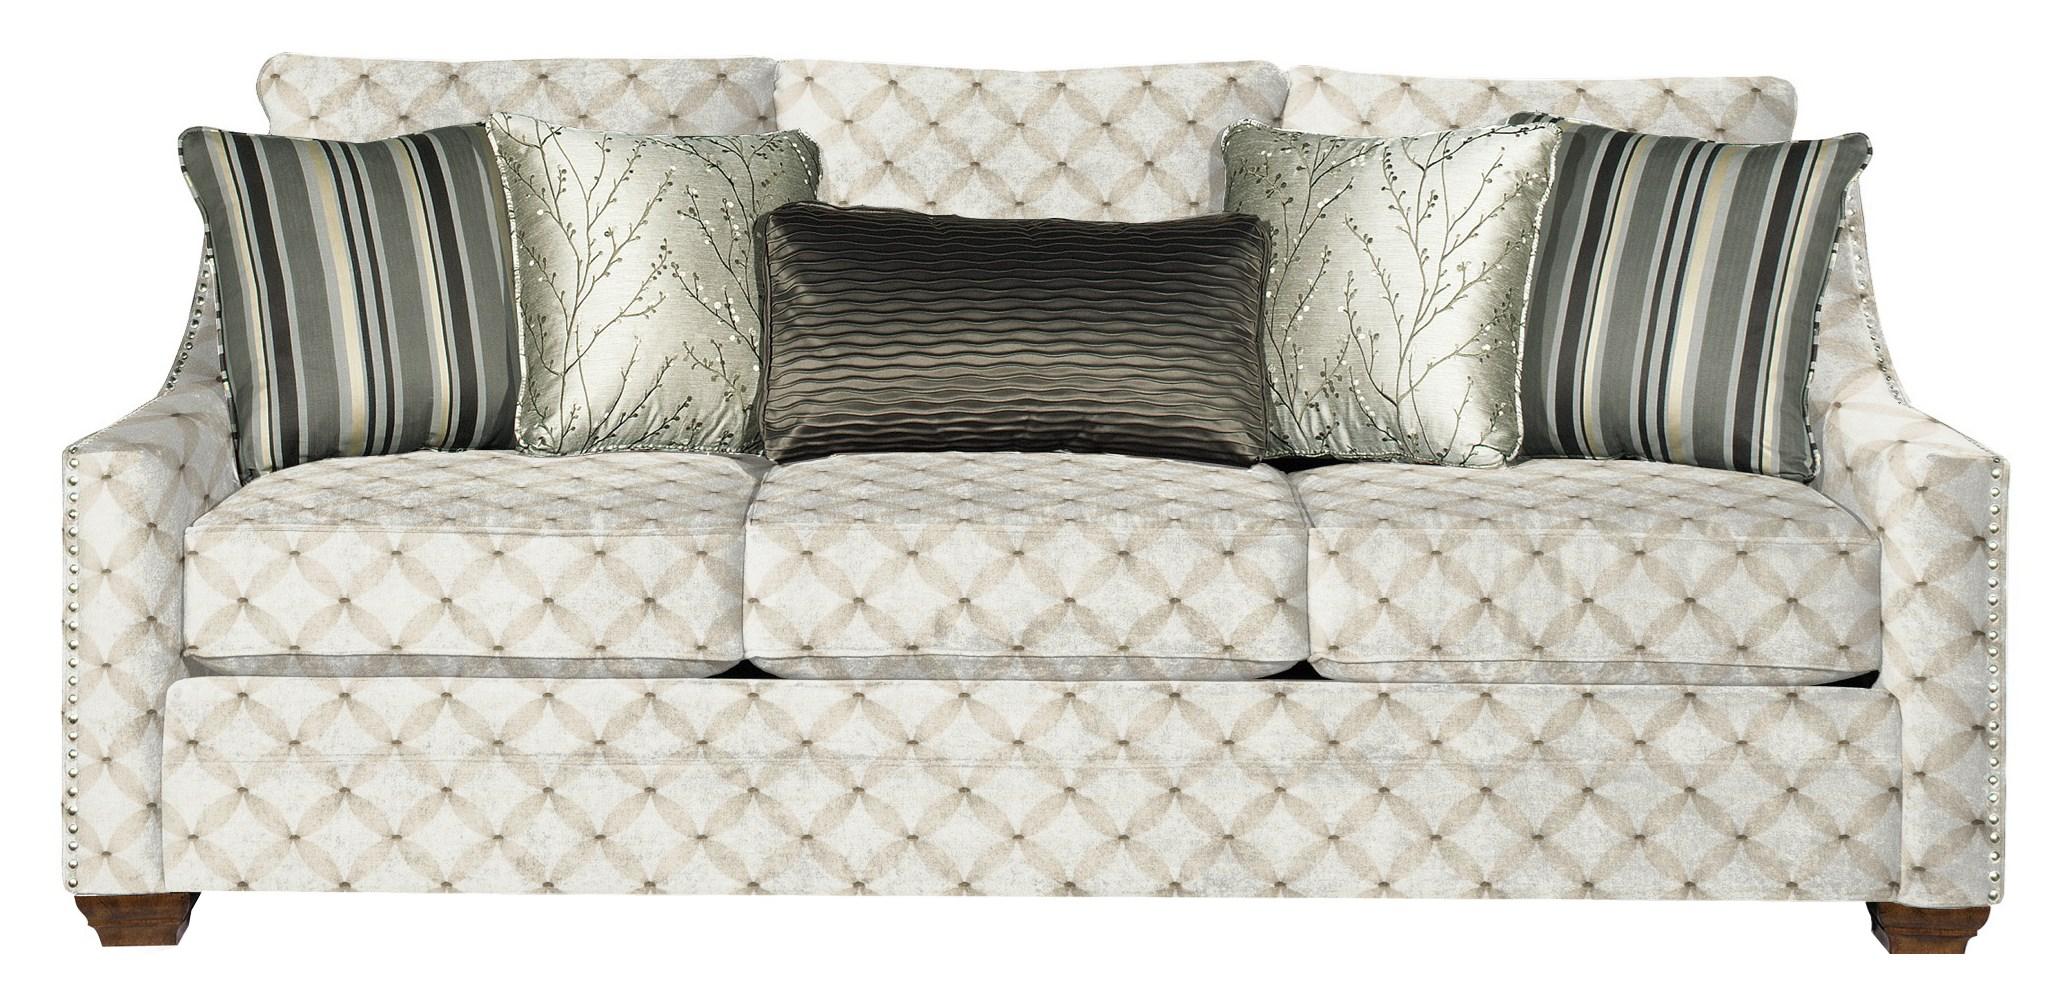 Craftmaster 7335 Sofa - Item Number: 733550-LISBOA-31